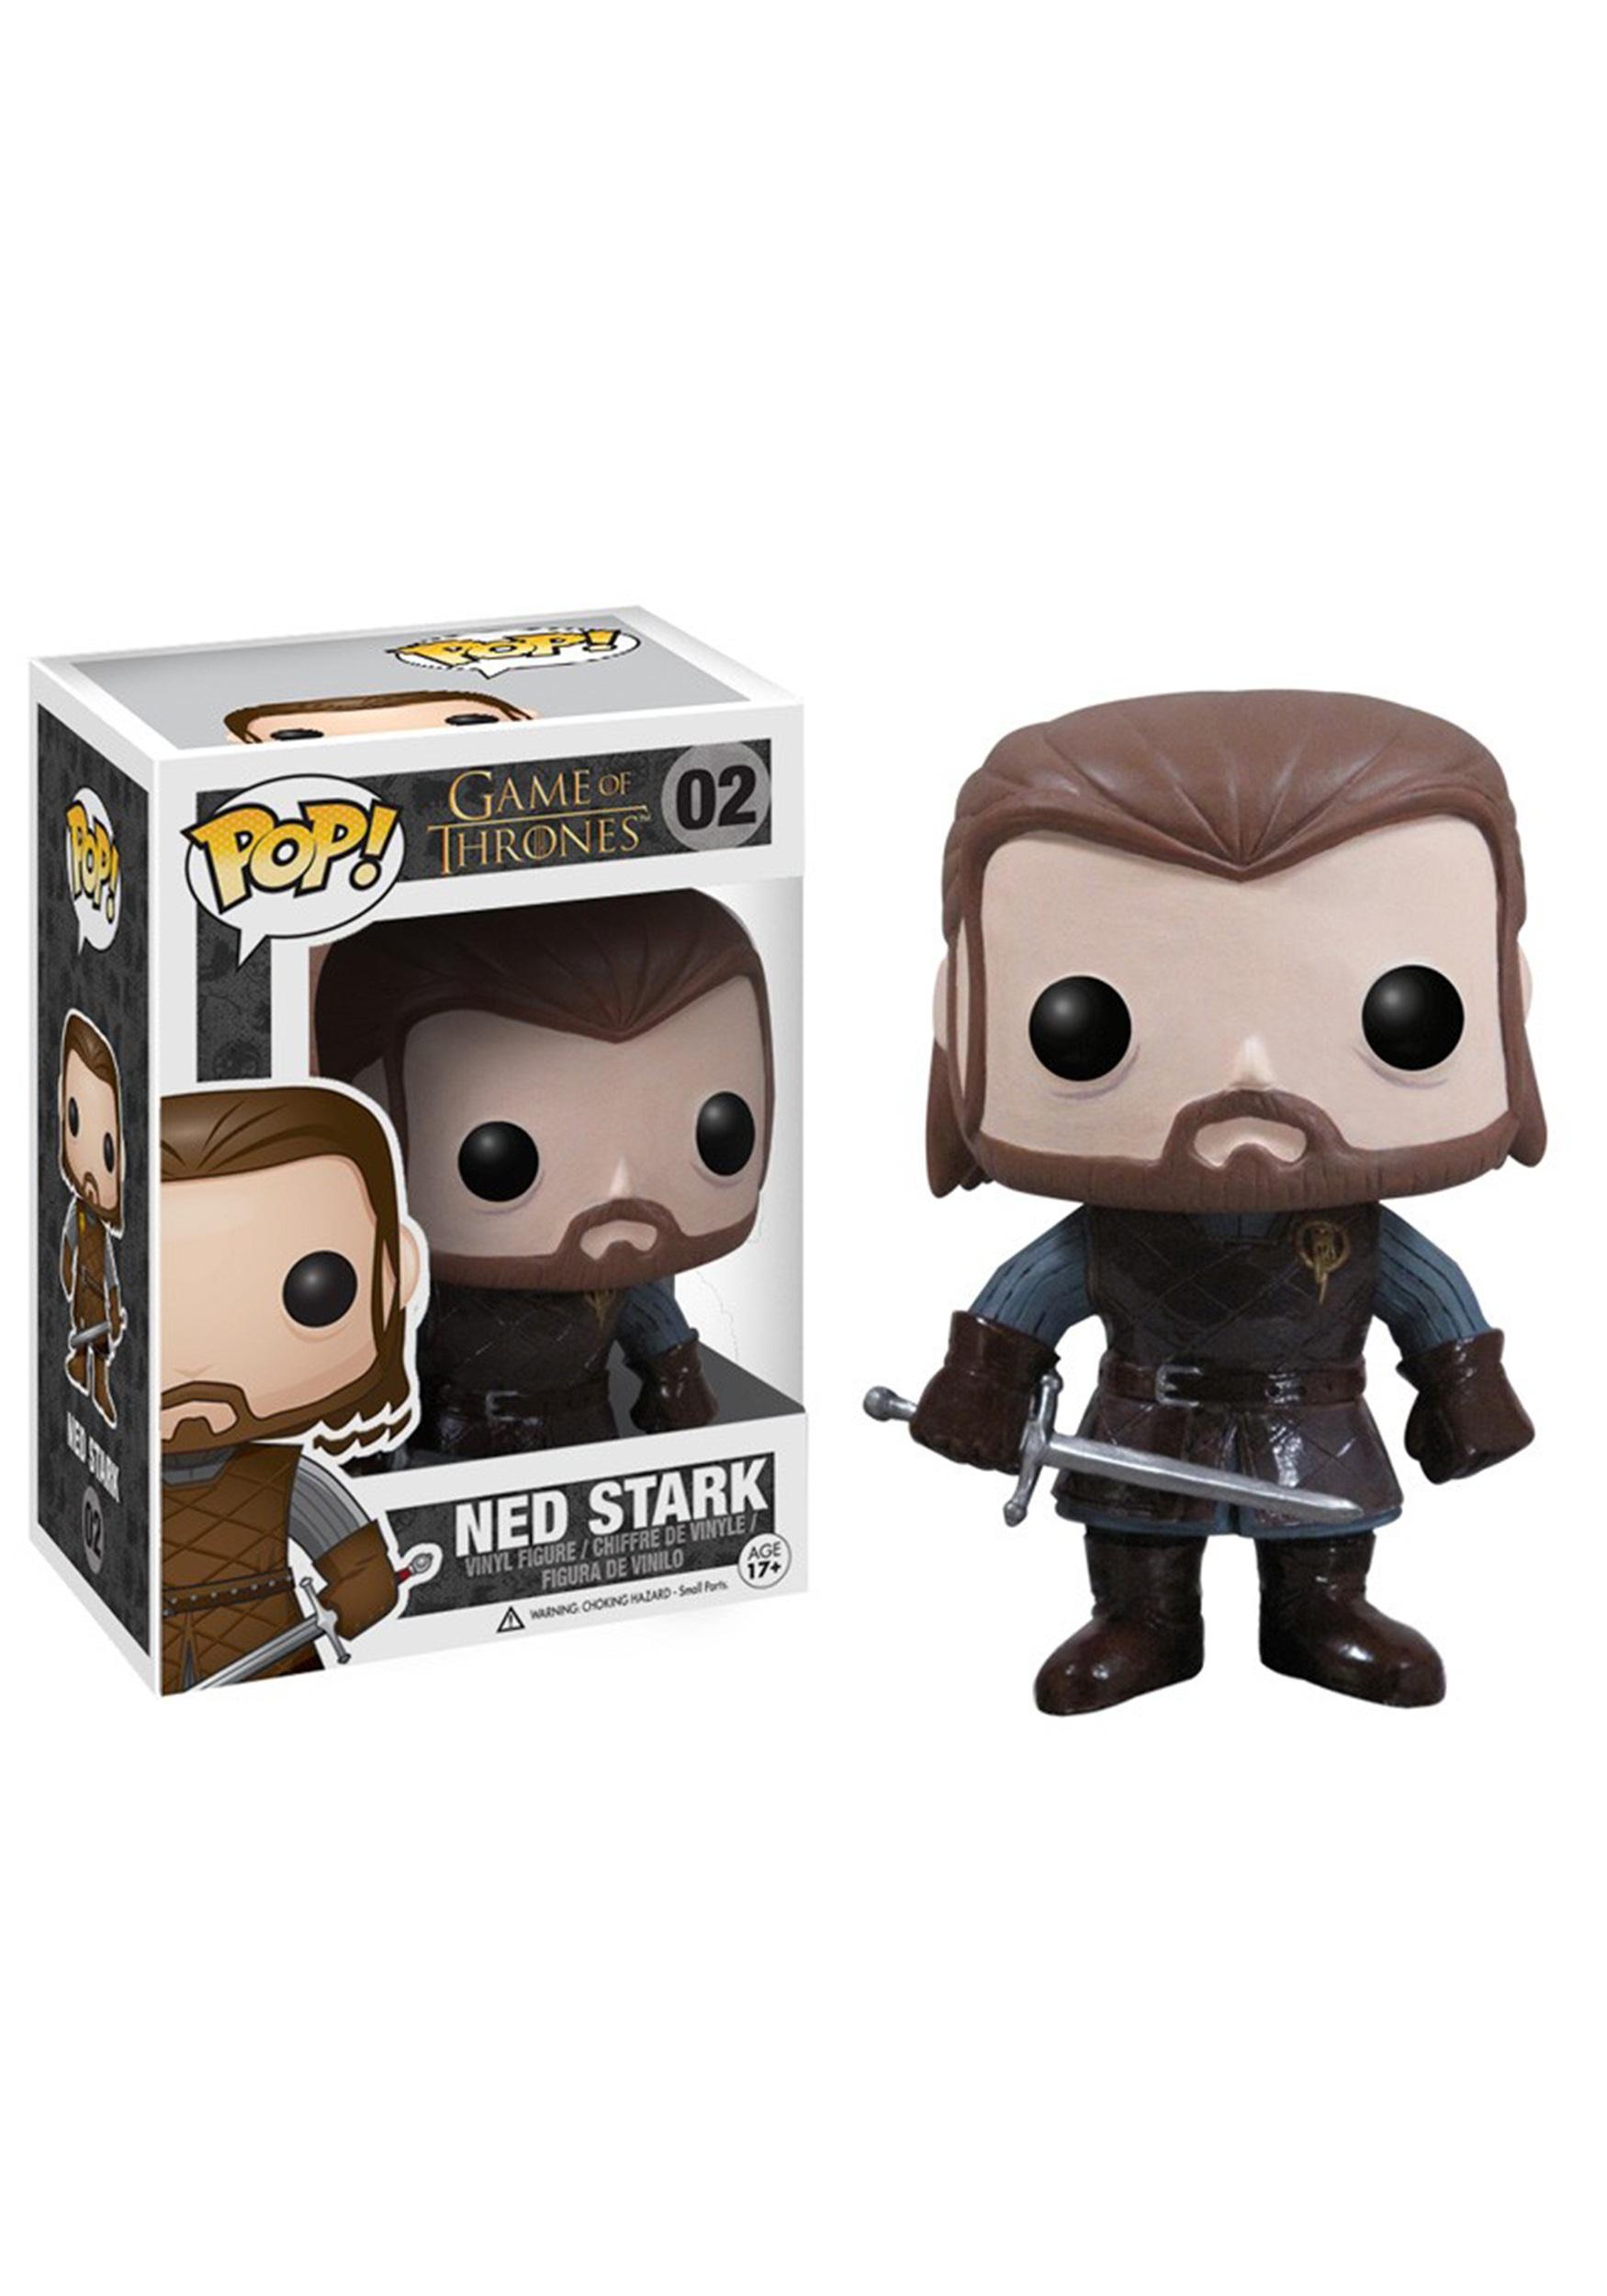 POP Game of Thrones Ned Stark Vinyl Figure FN3016